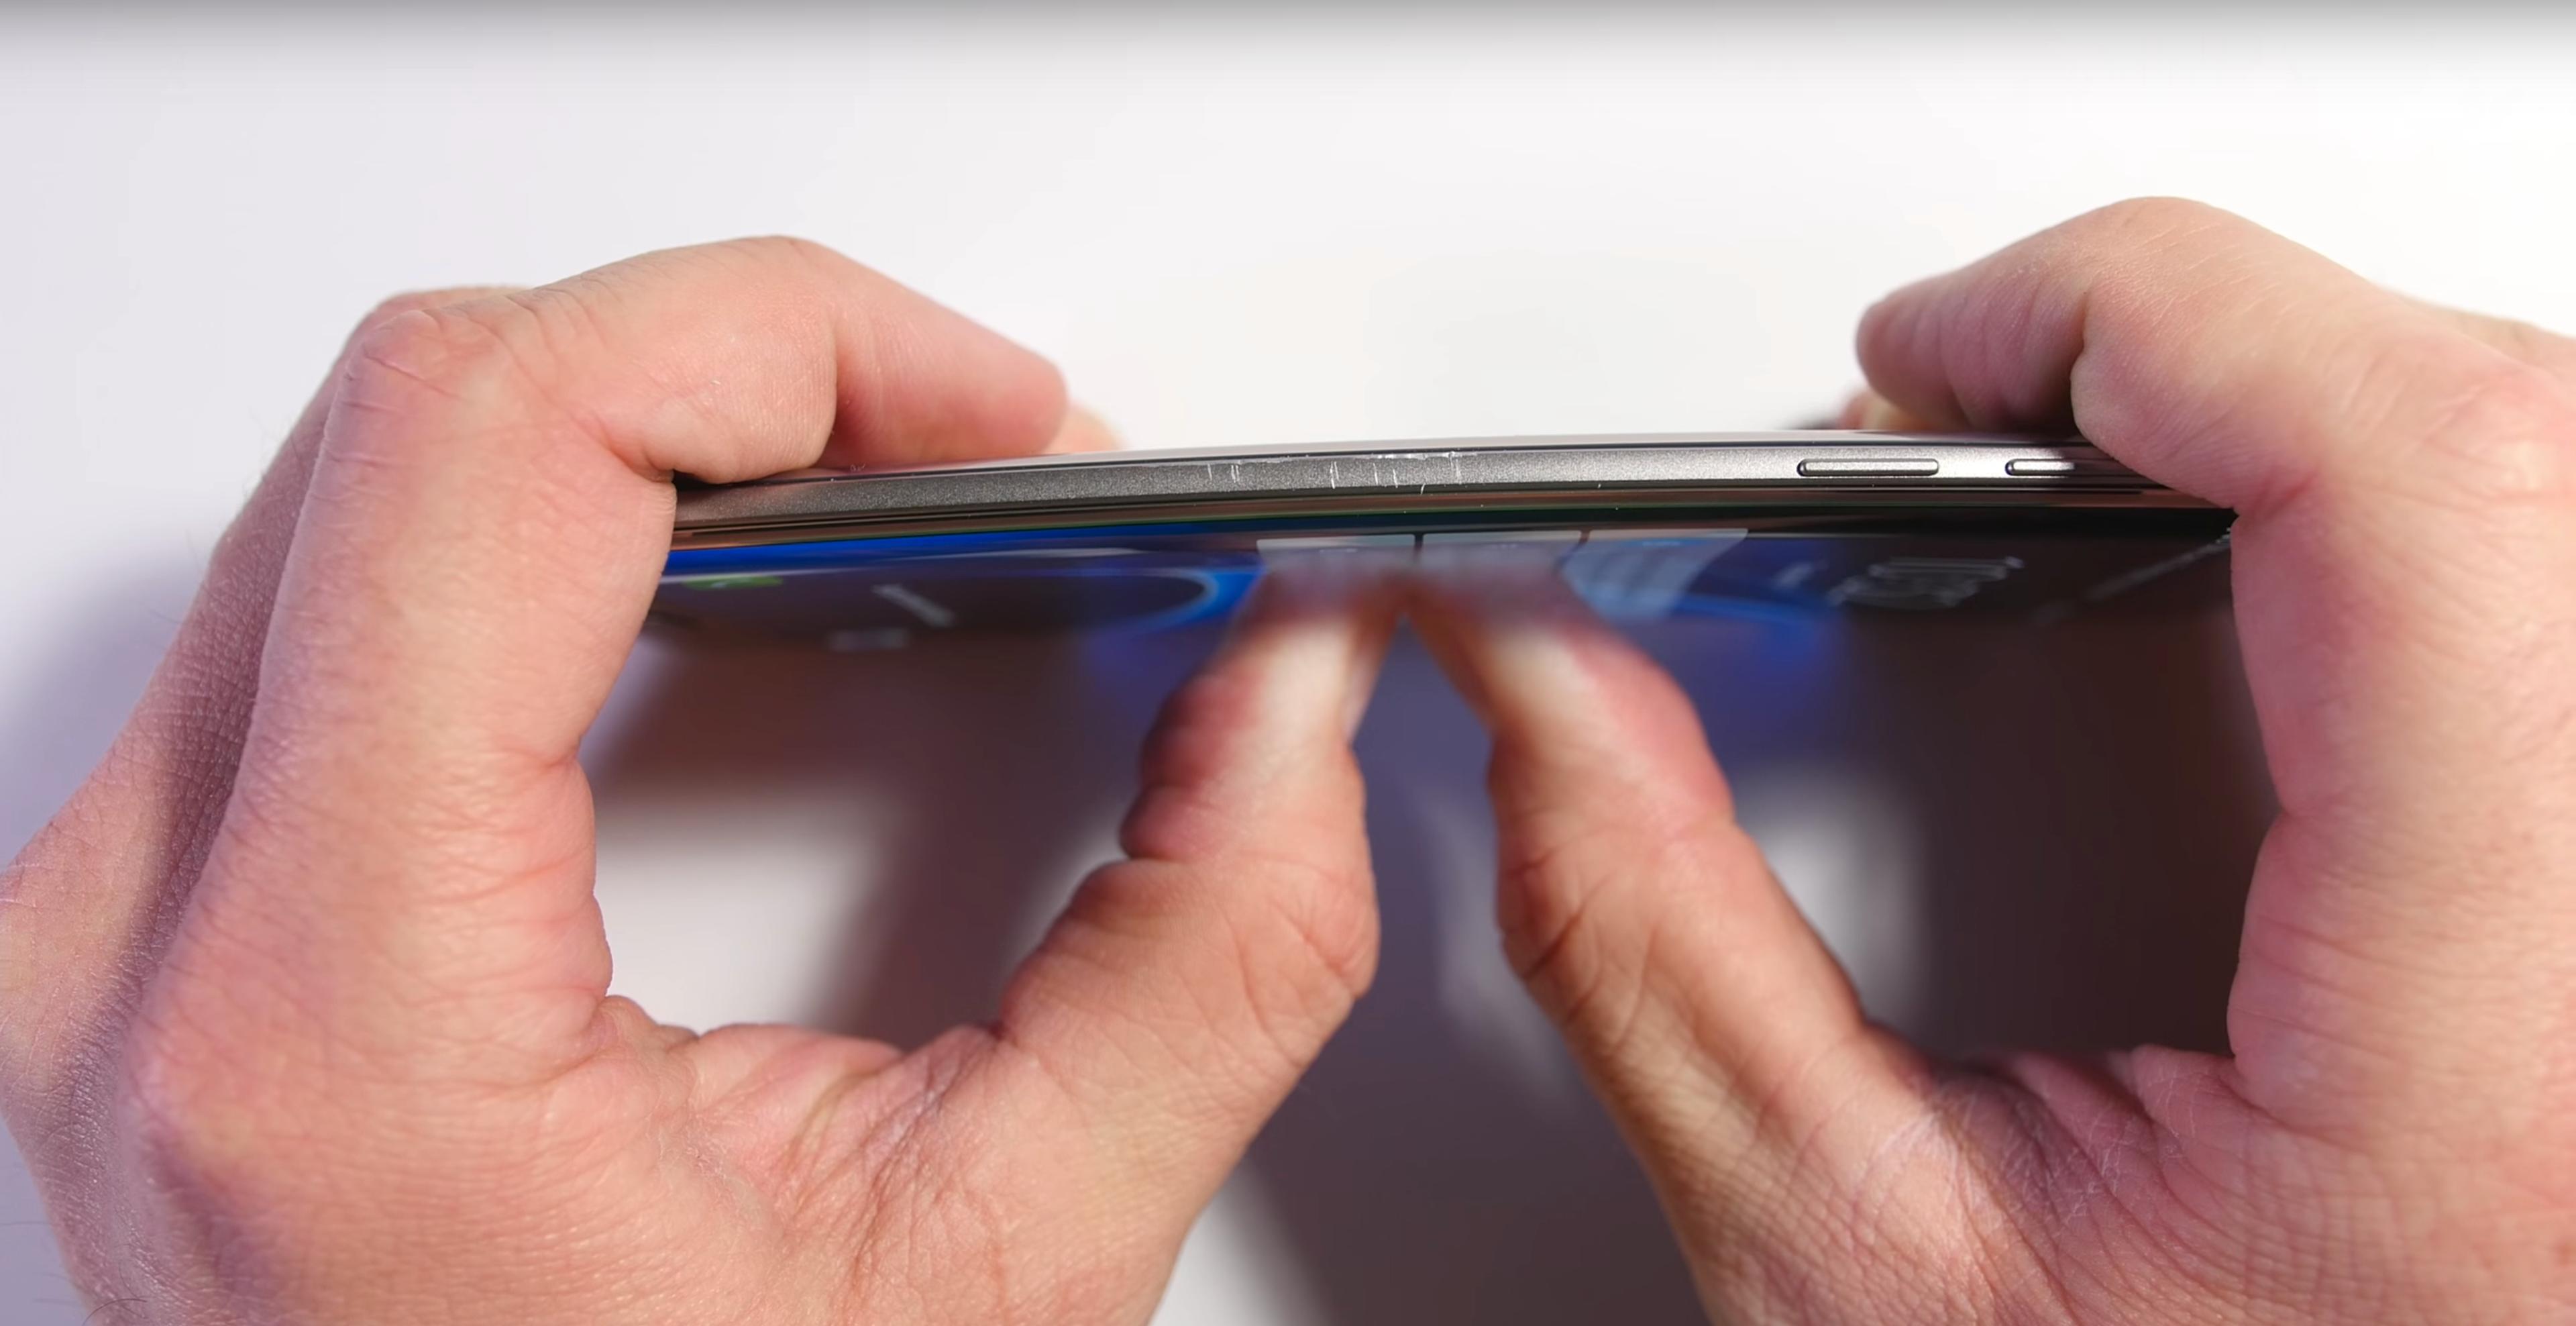 Bøyetesten bestod Galaxy S7 Edge med glans.